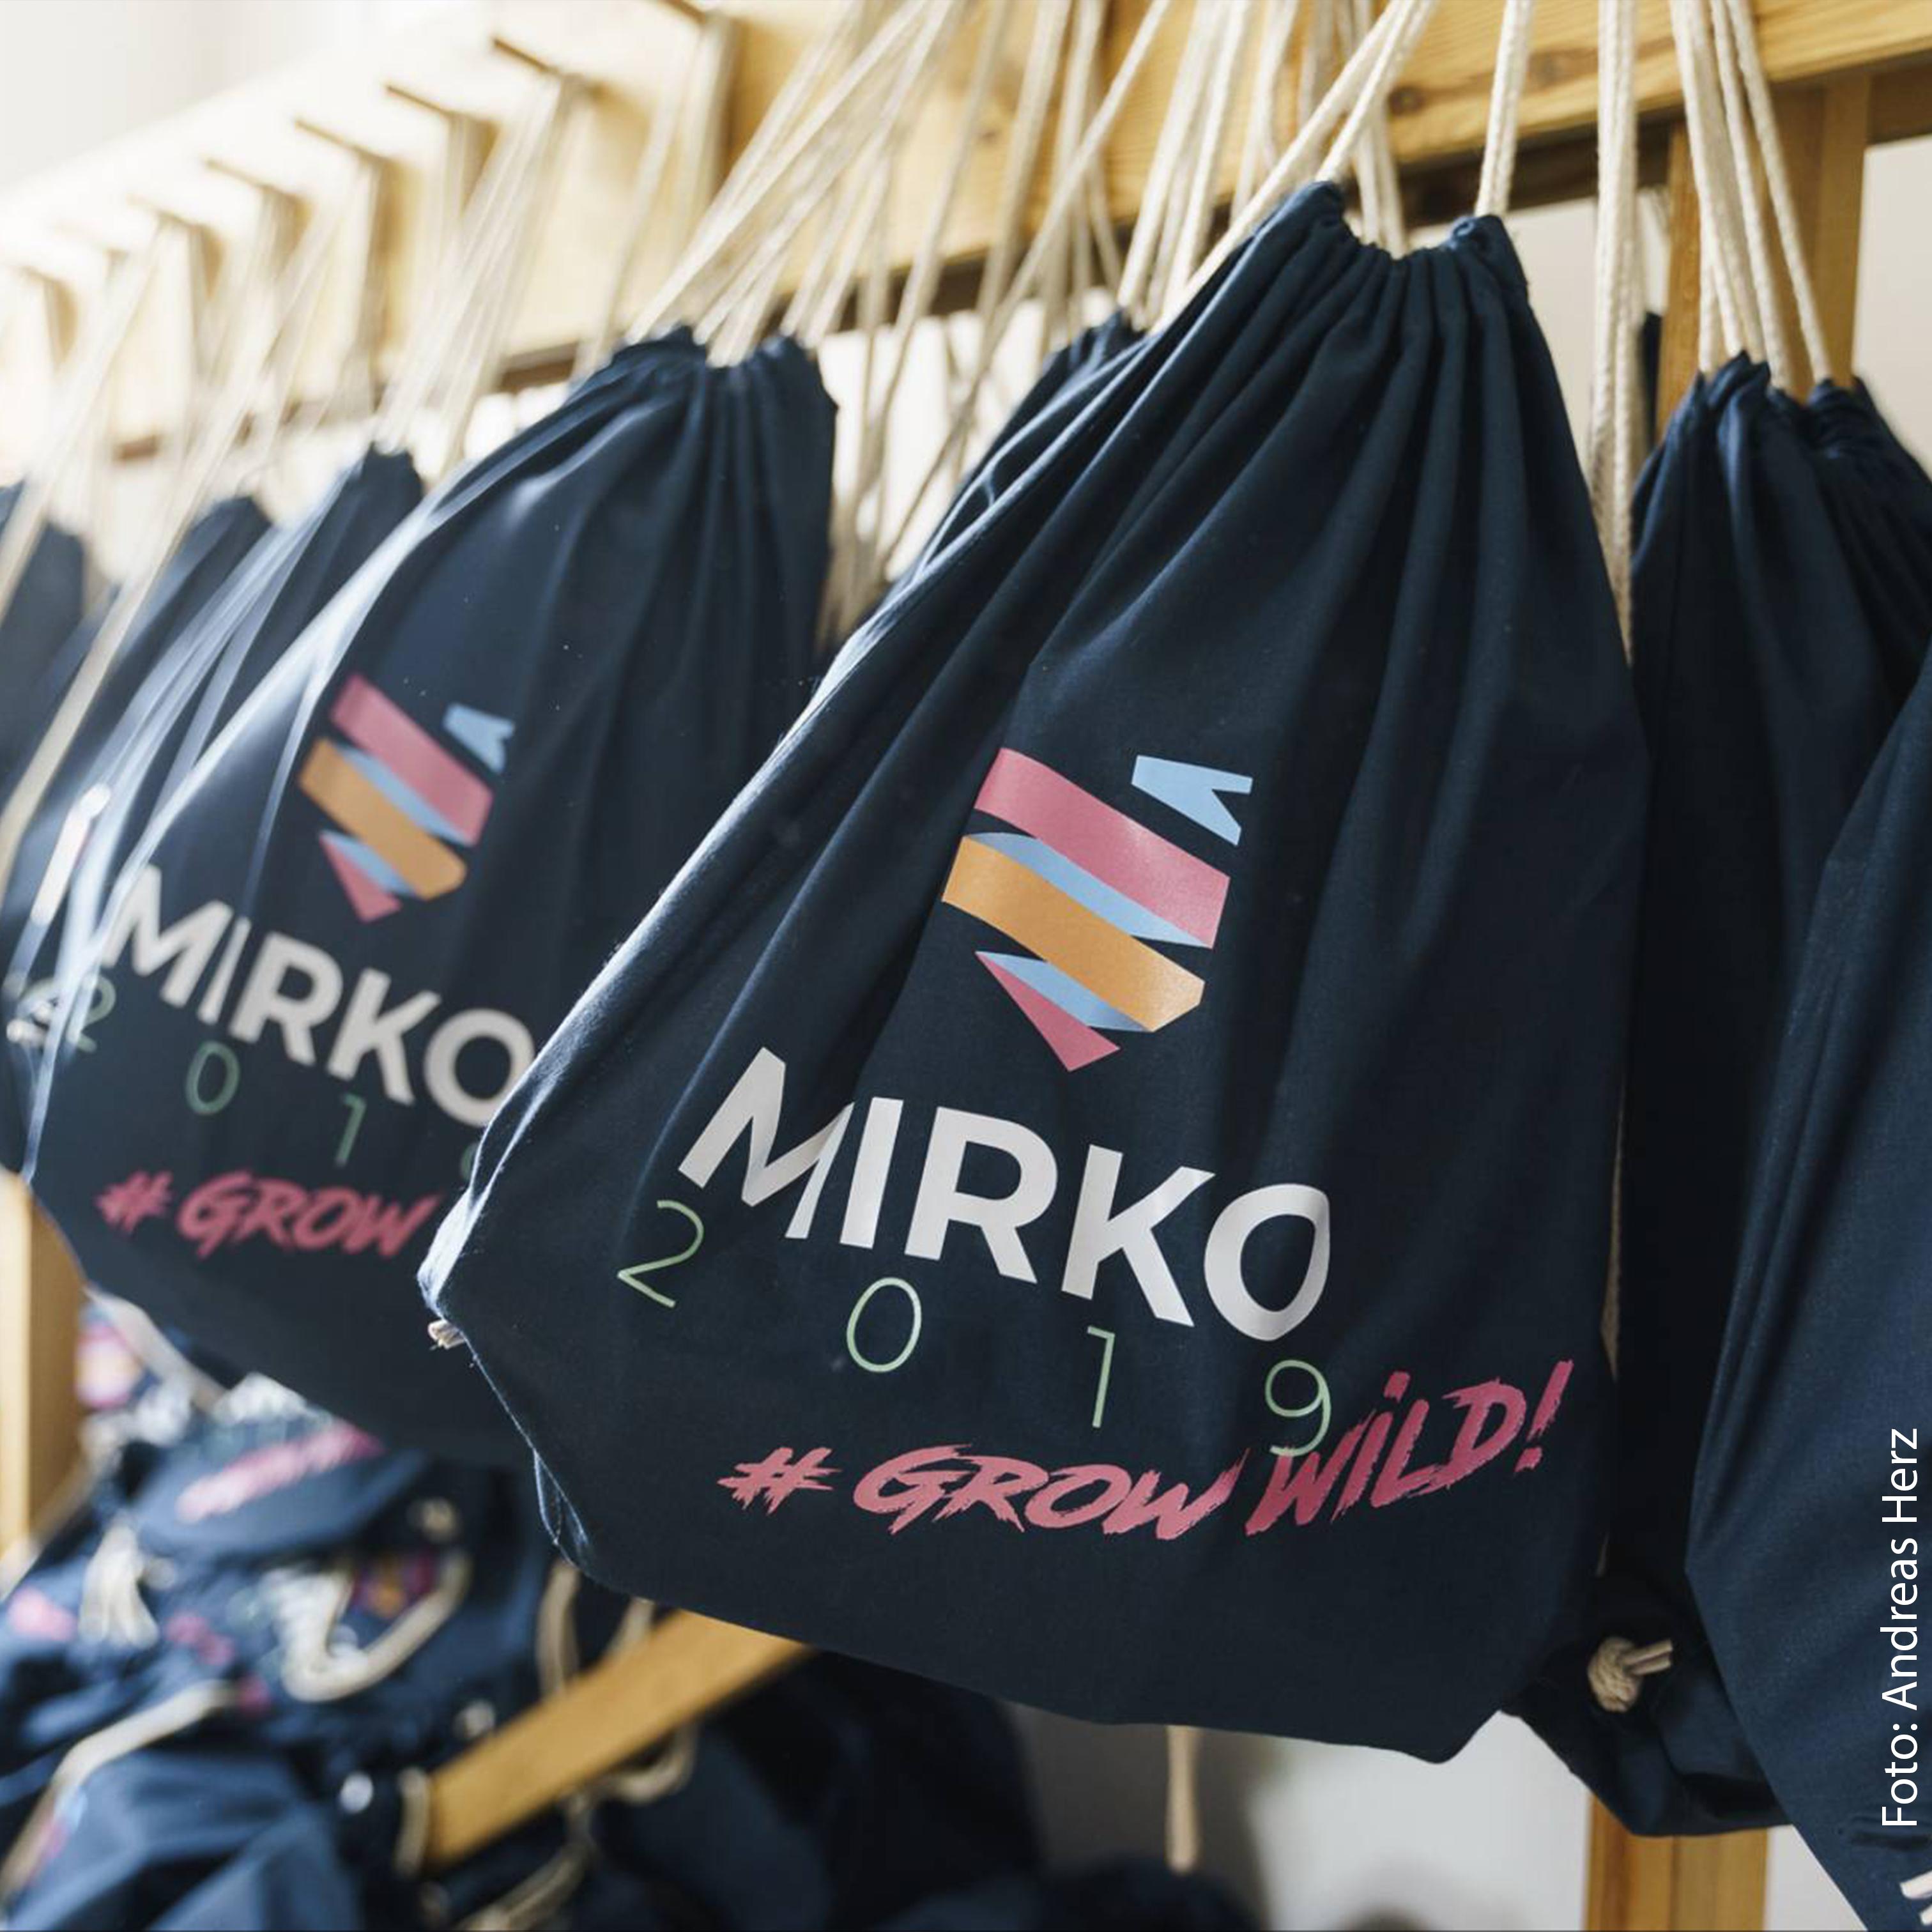 mirko2019_andreas_herz_logo_wjohv_design_nitschke.jpg